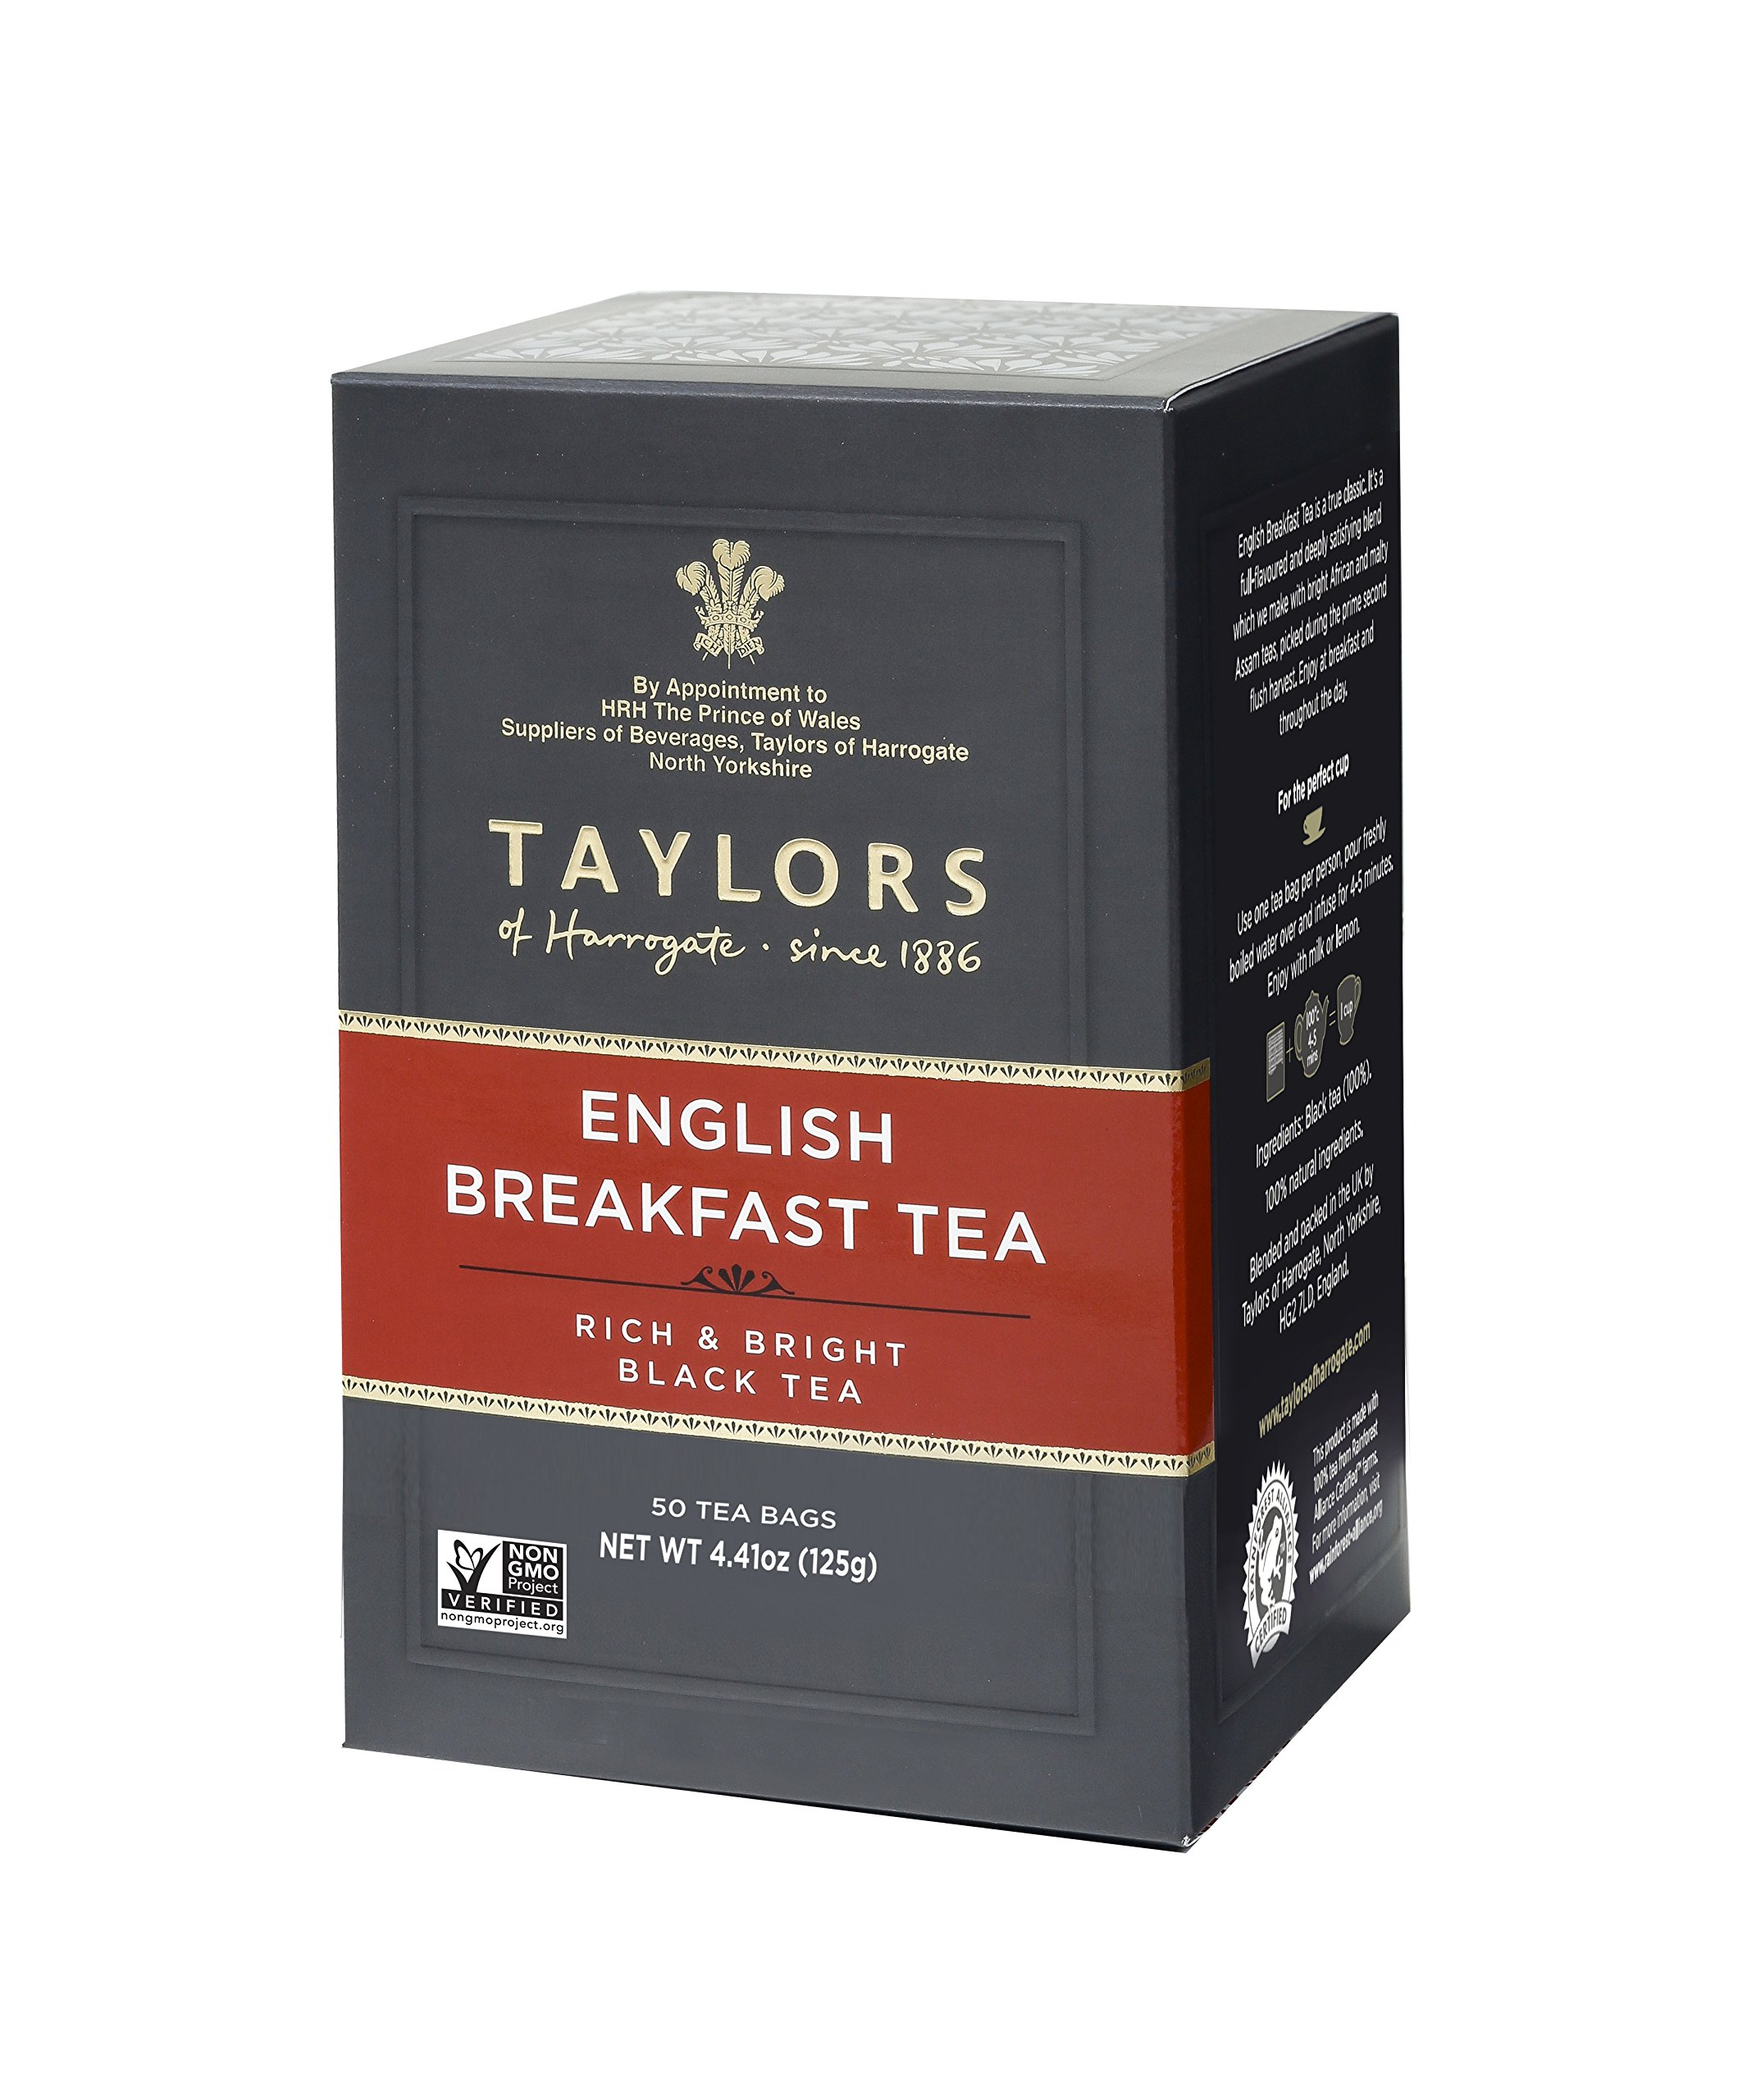 Taylors of Harrogate English Breakfast, 50 Teabags (Pack of 6)